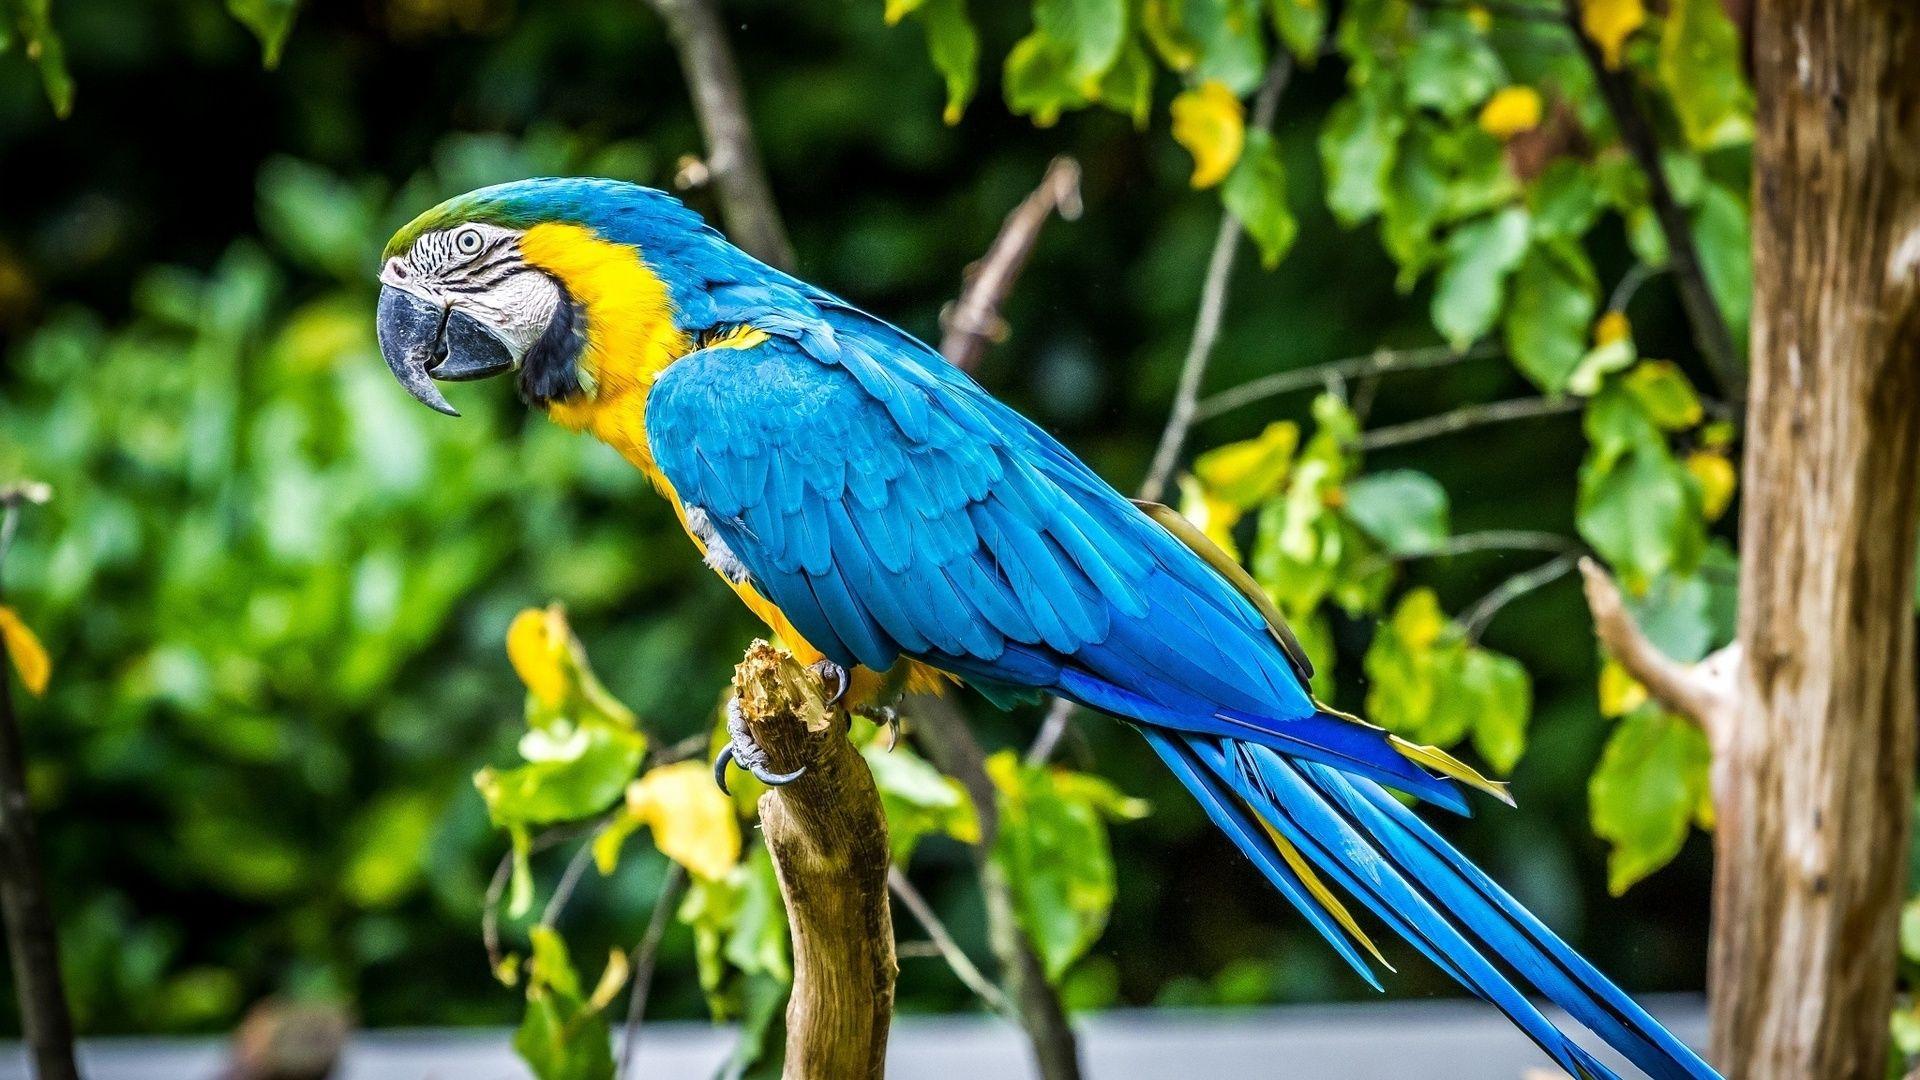 Macaw Parrot Colors